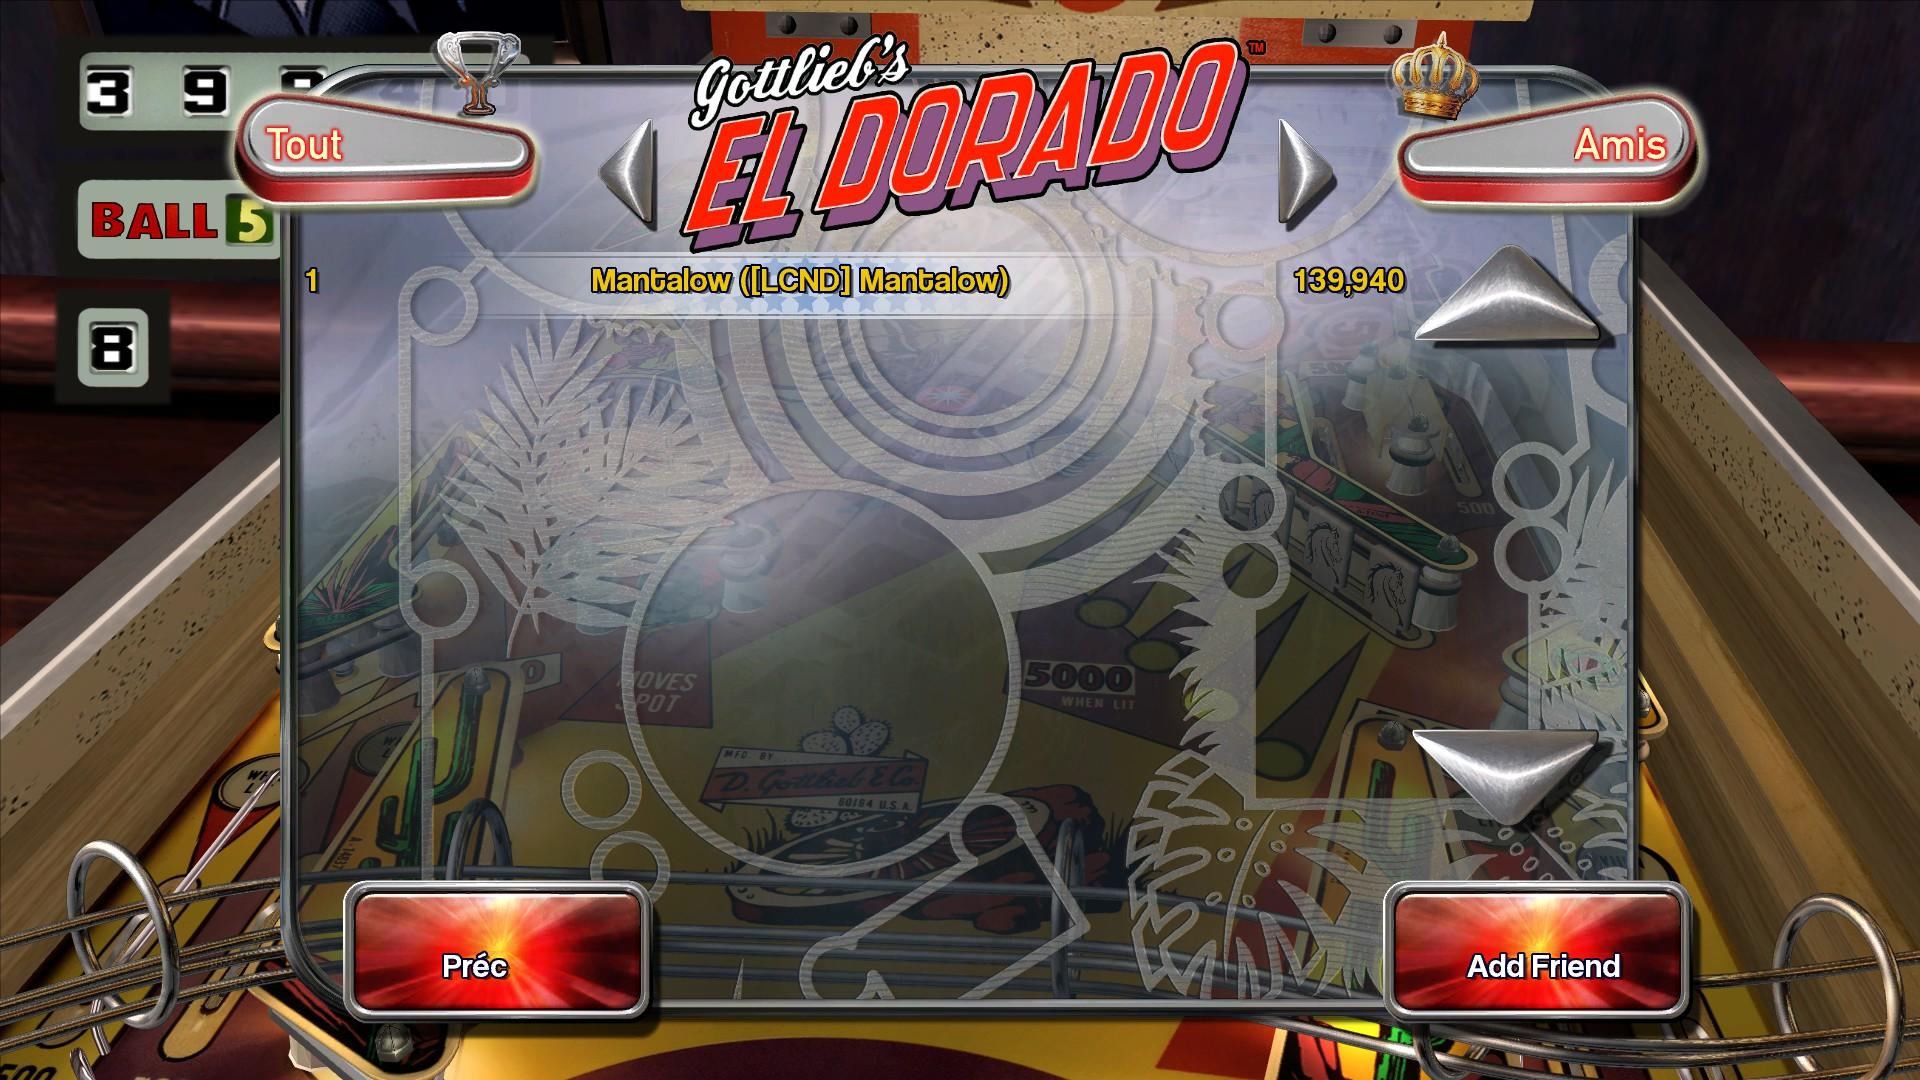 Mantalow: Pinball Arcade: El Dorado (PC) 139,940 points on 2016-01-30 03:00:36